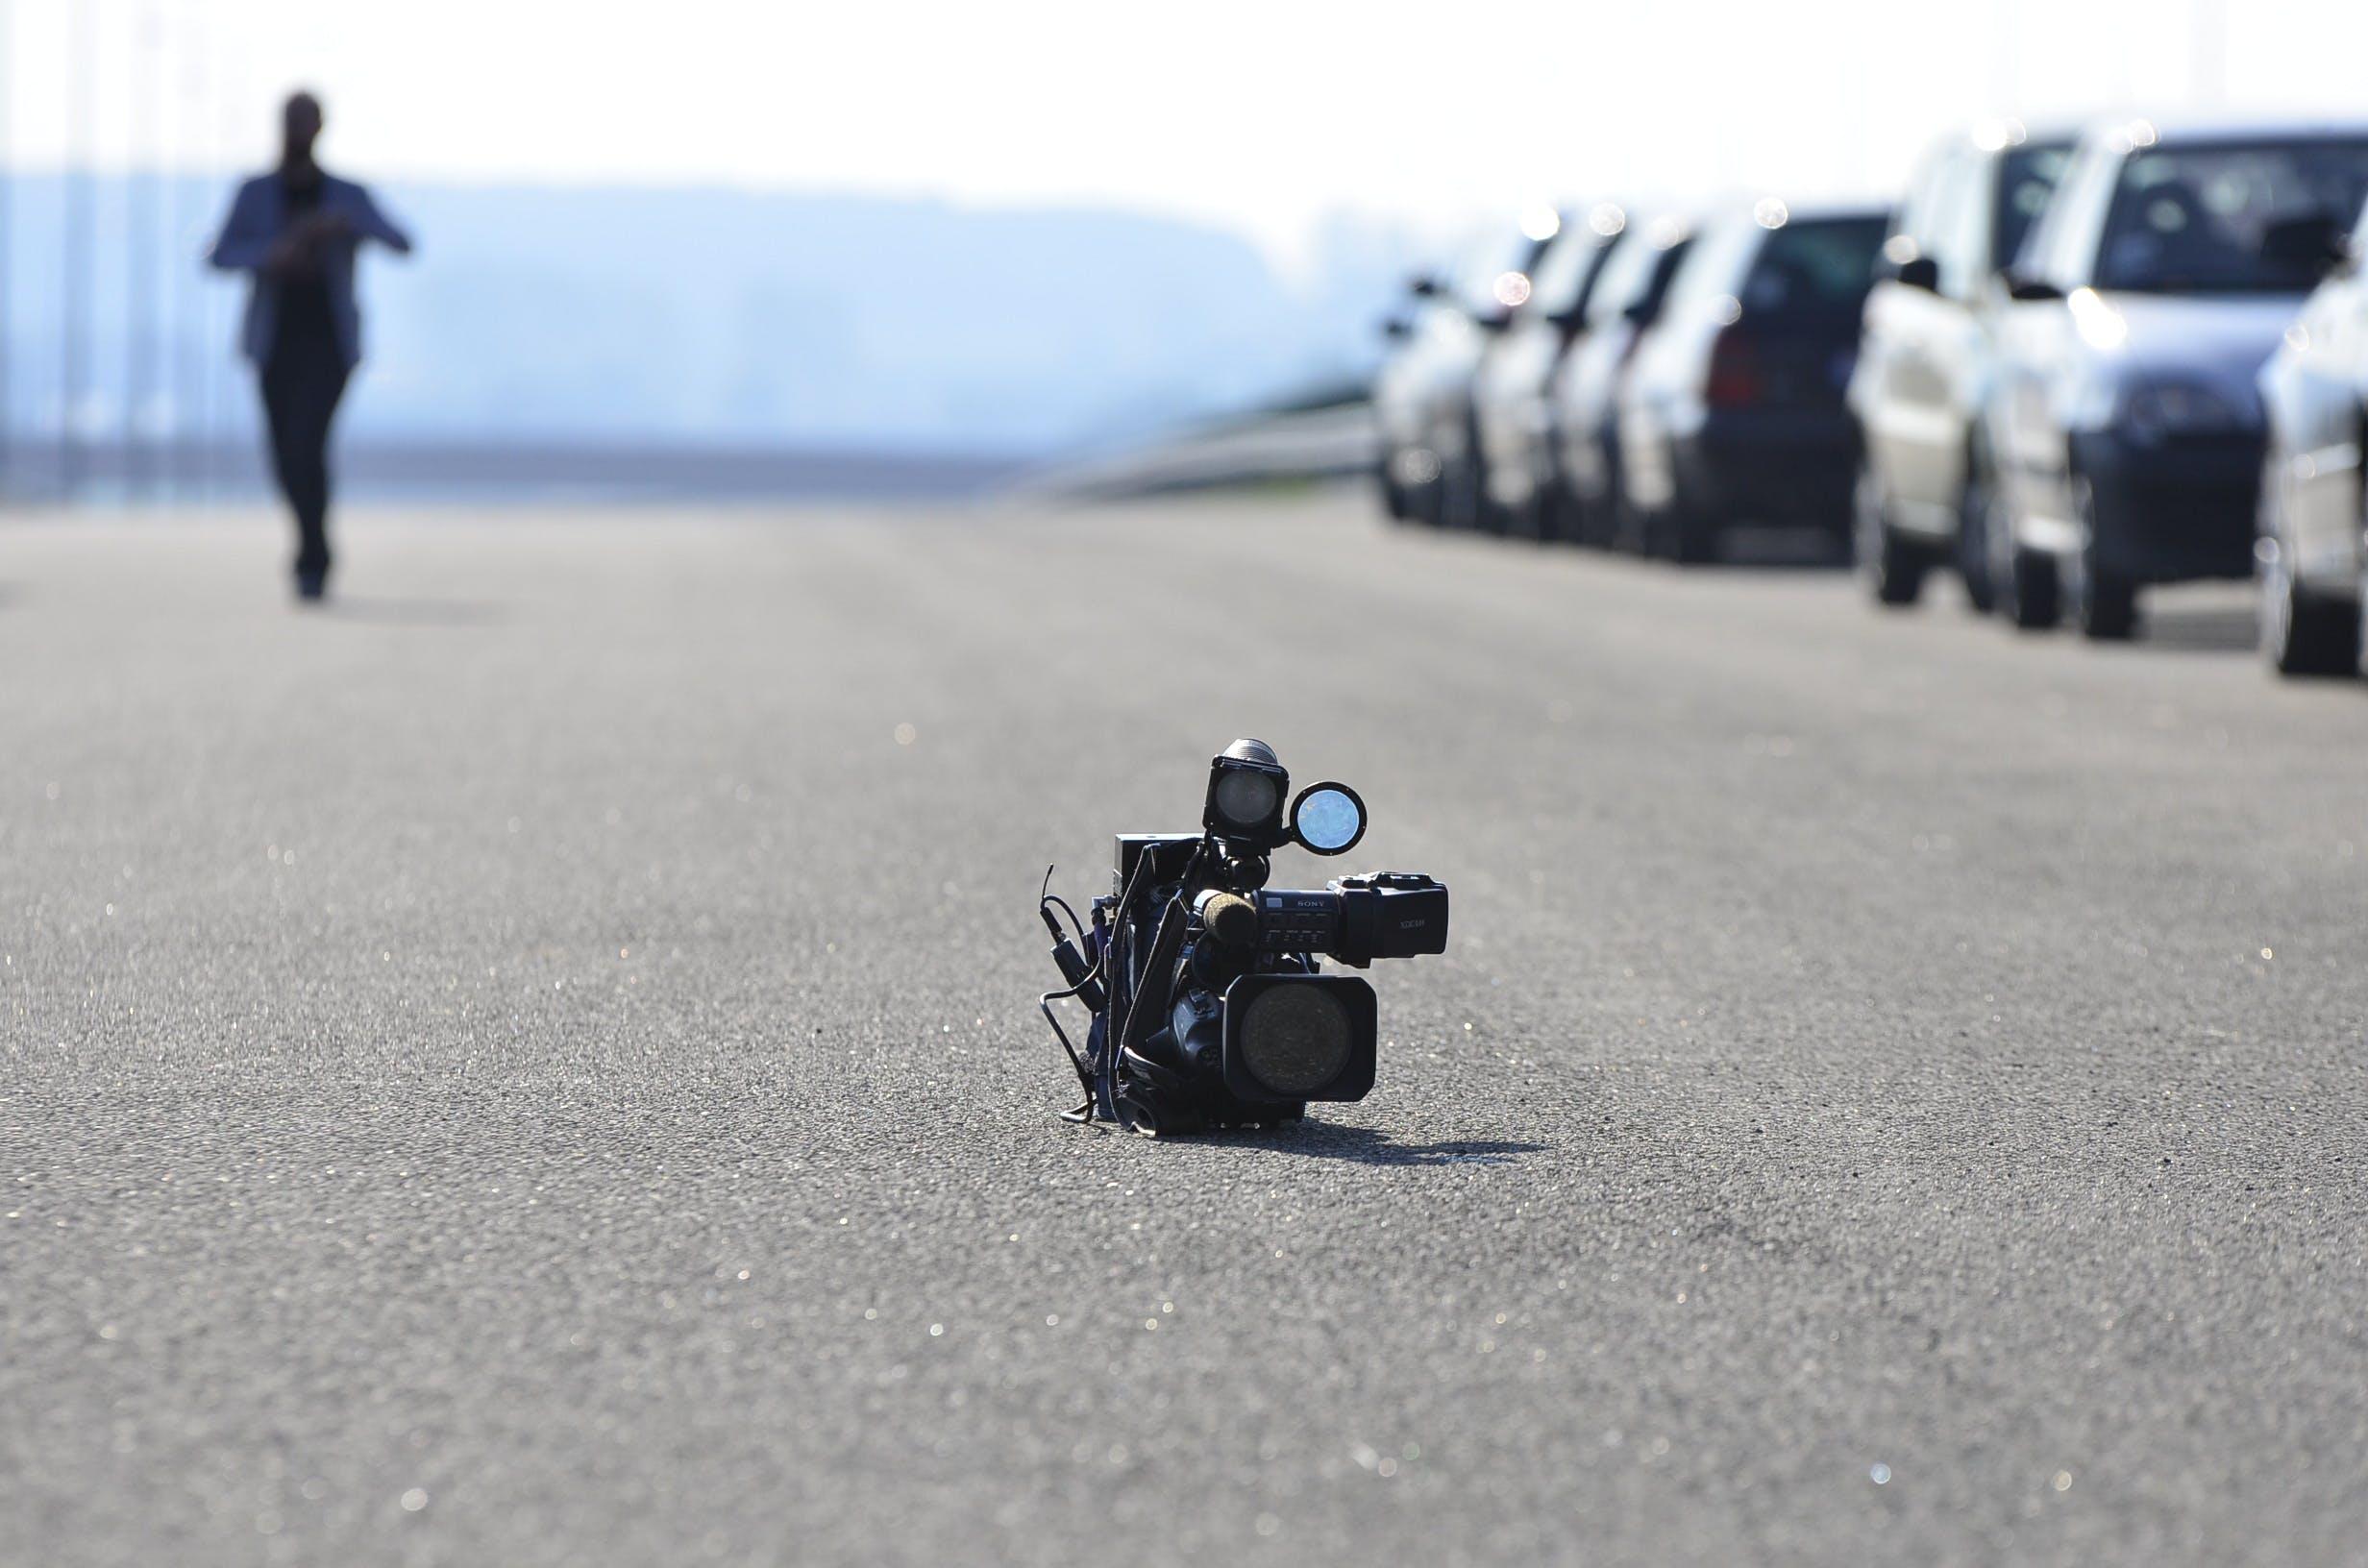 Kostenloses Stock Foto zu straße, person, kamera, makro